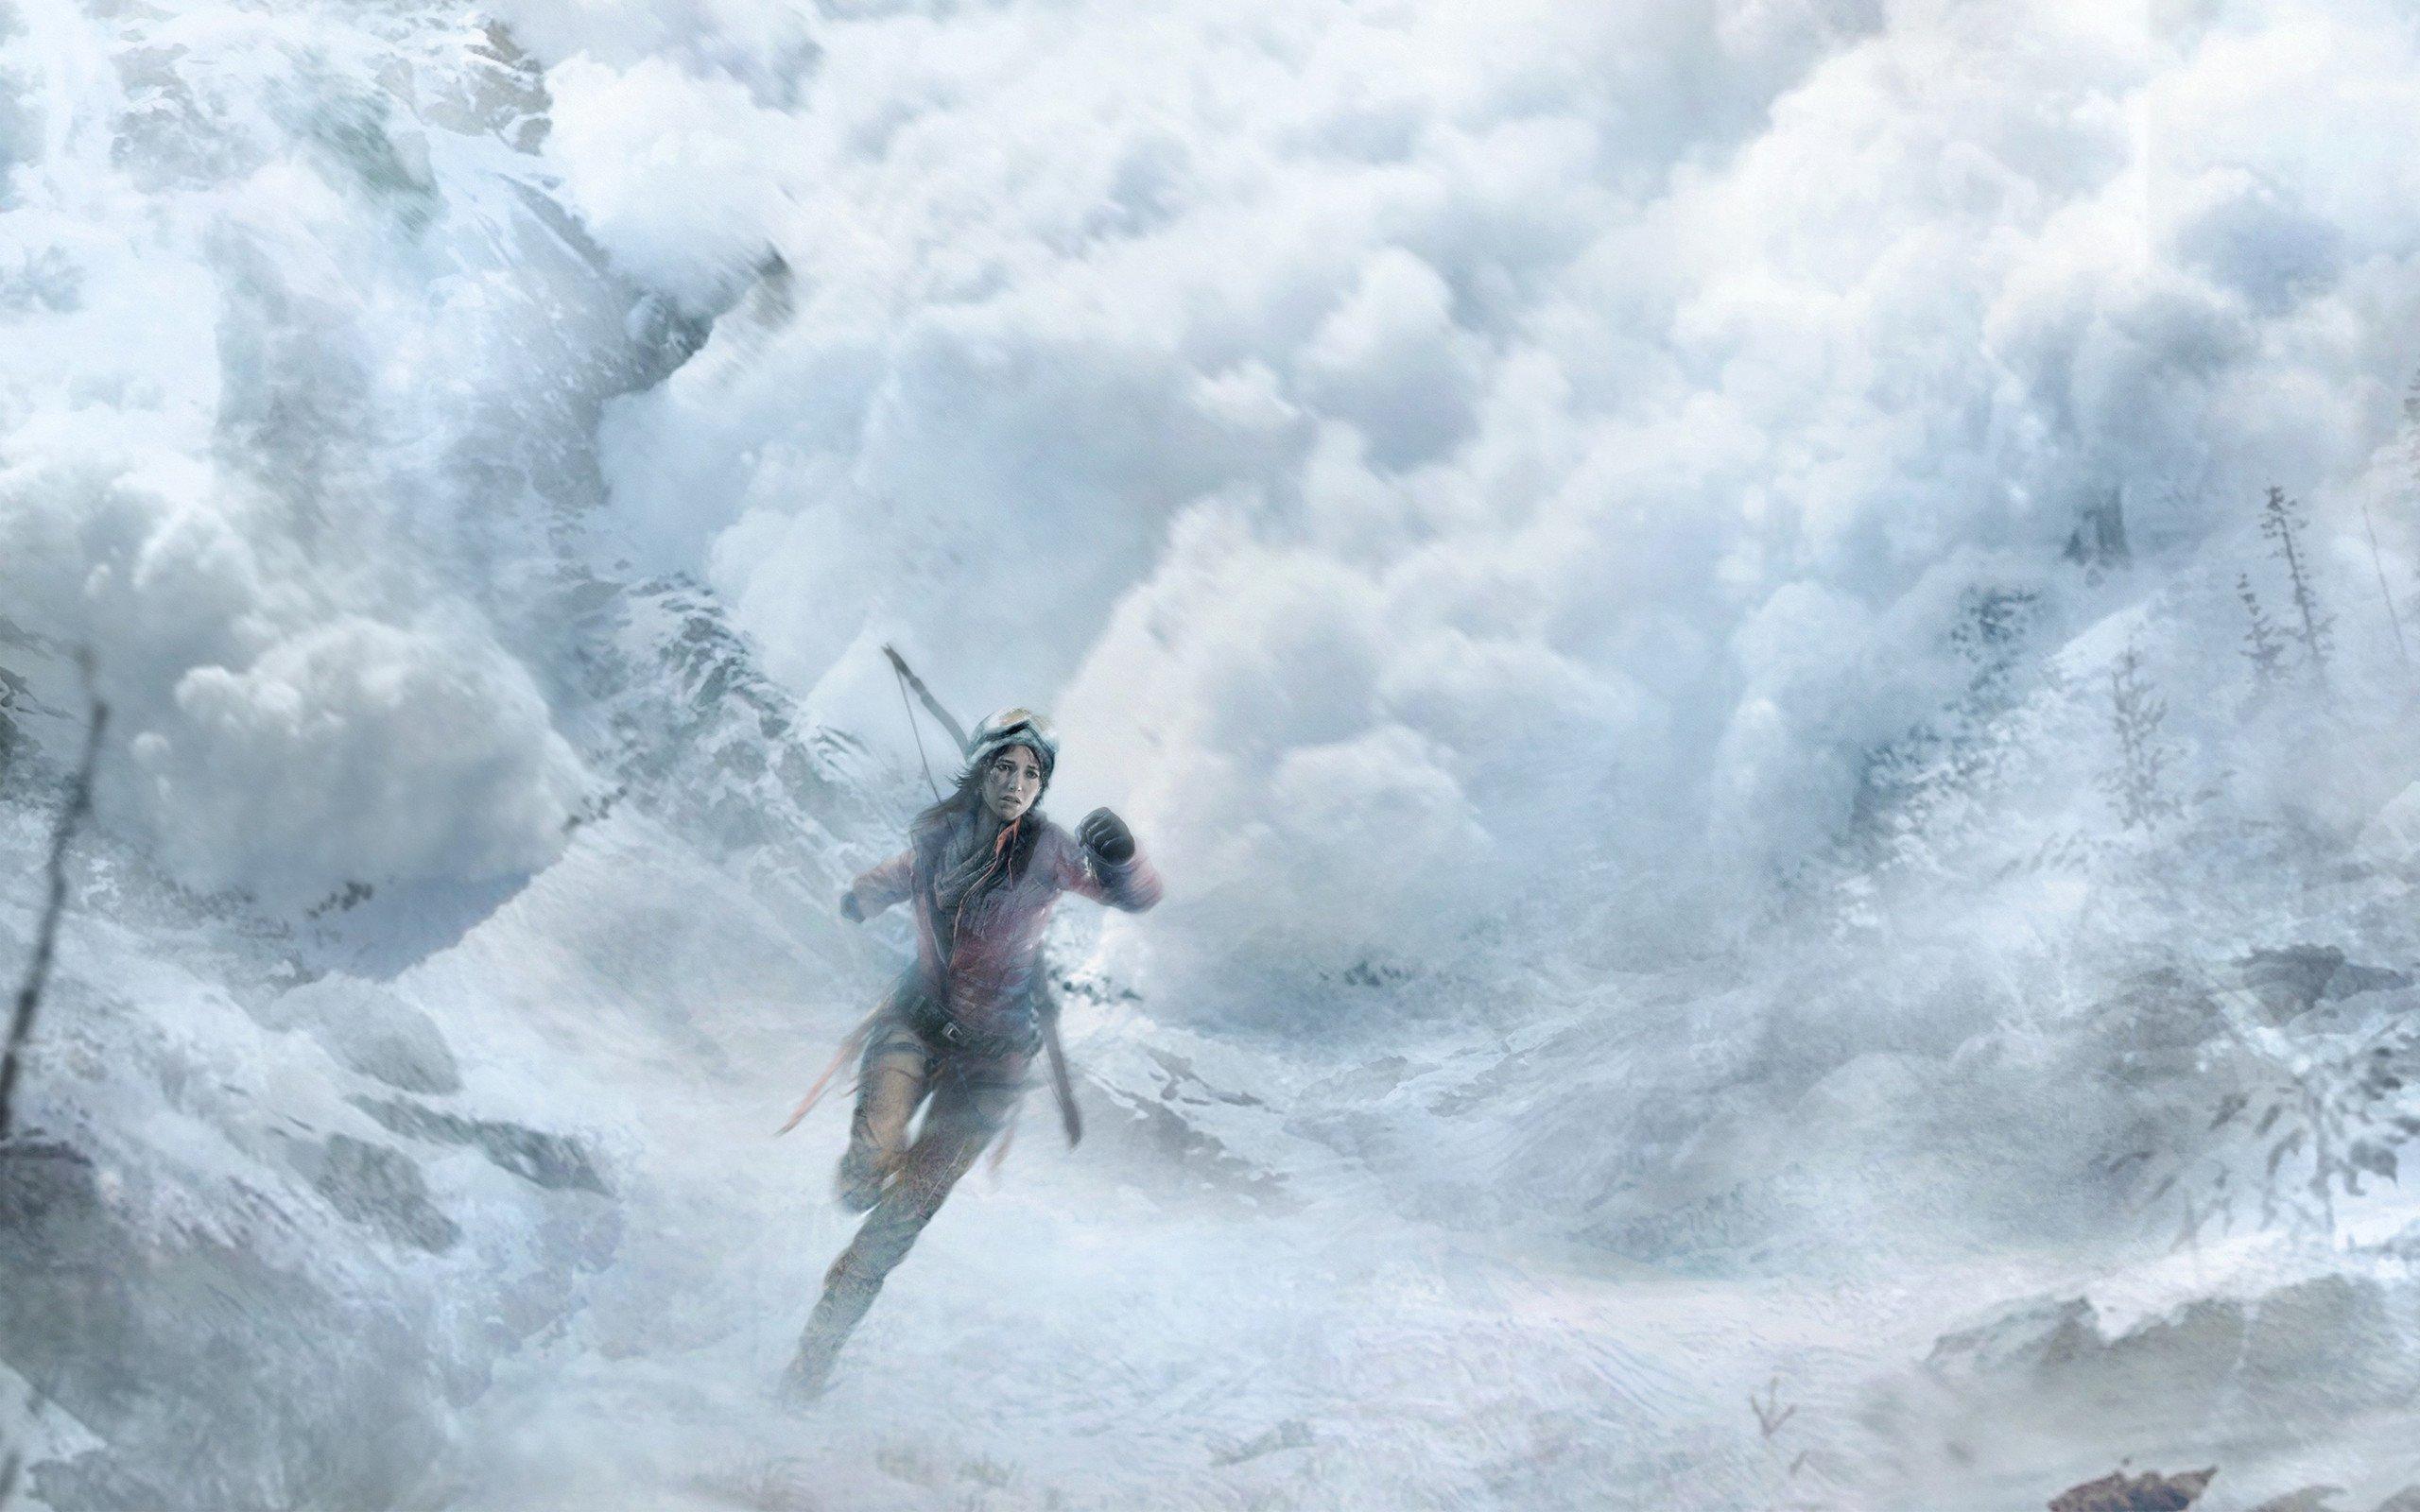 Rise of the Tomb Raider 4K Duvar Kağıdı